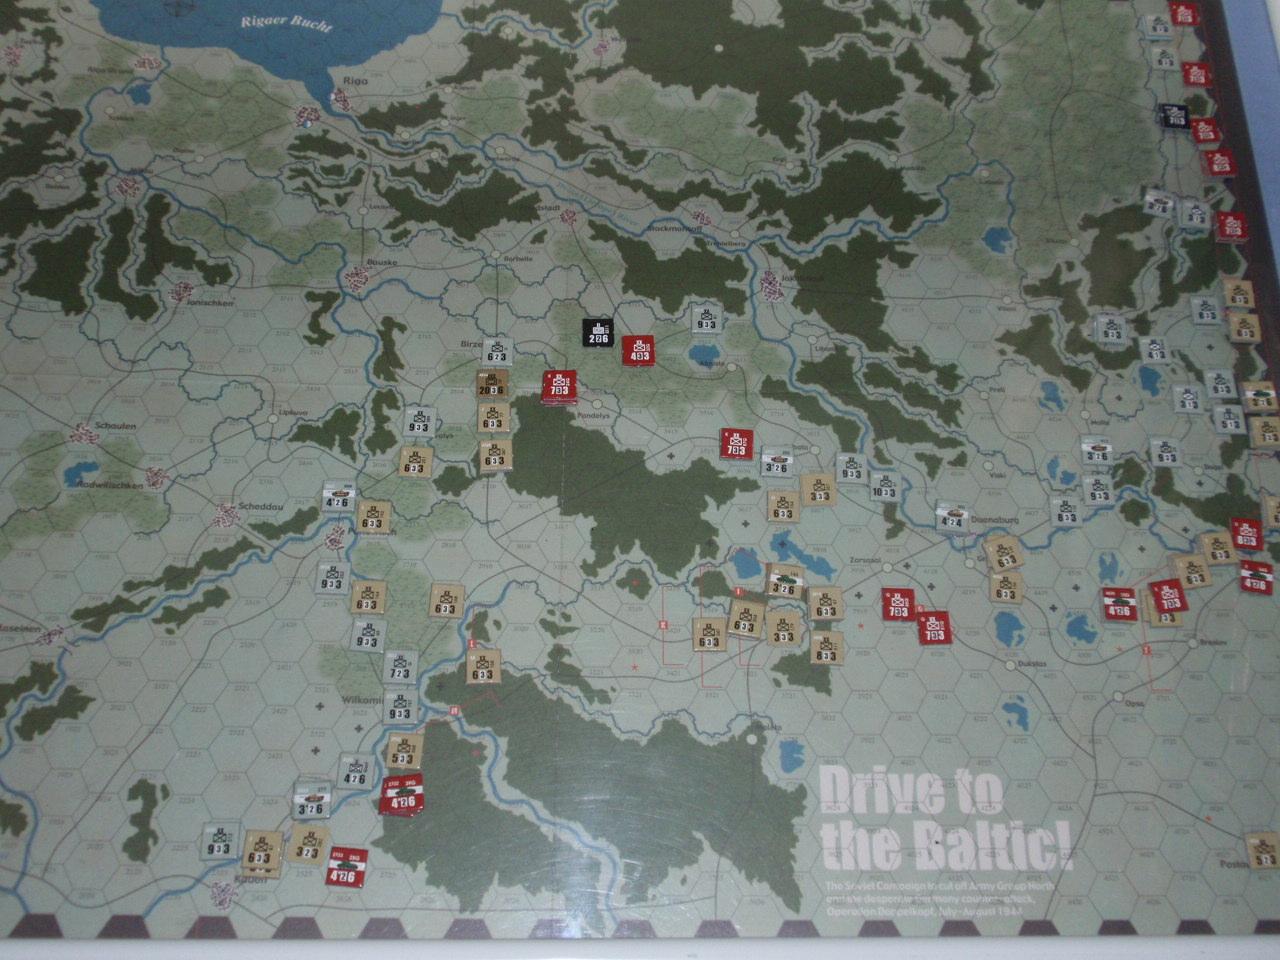 MIH/CMJ「Drive to the Baltic!」をソロプレイ①_b0162202_10313537.jpg